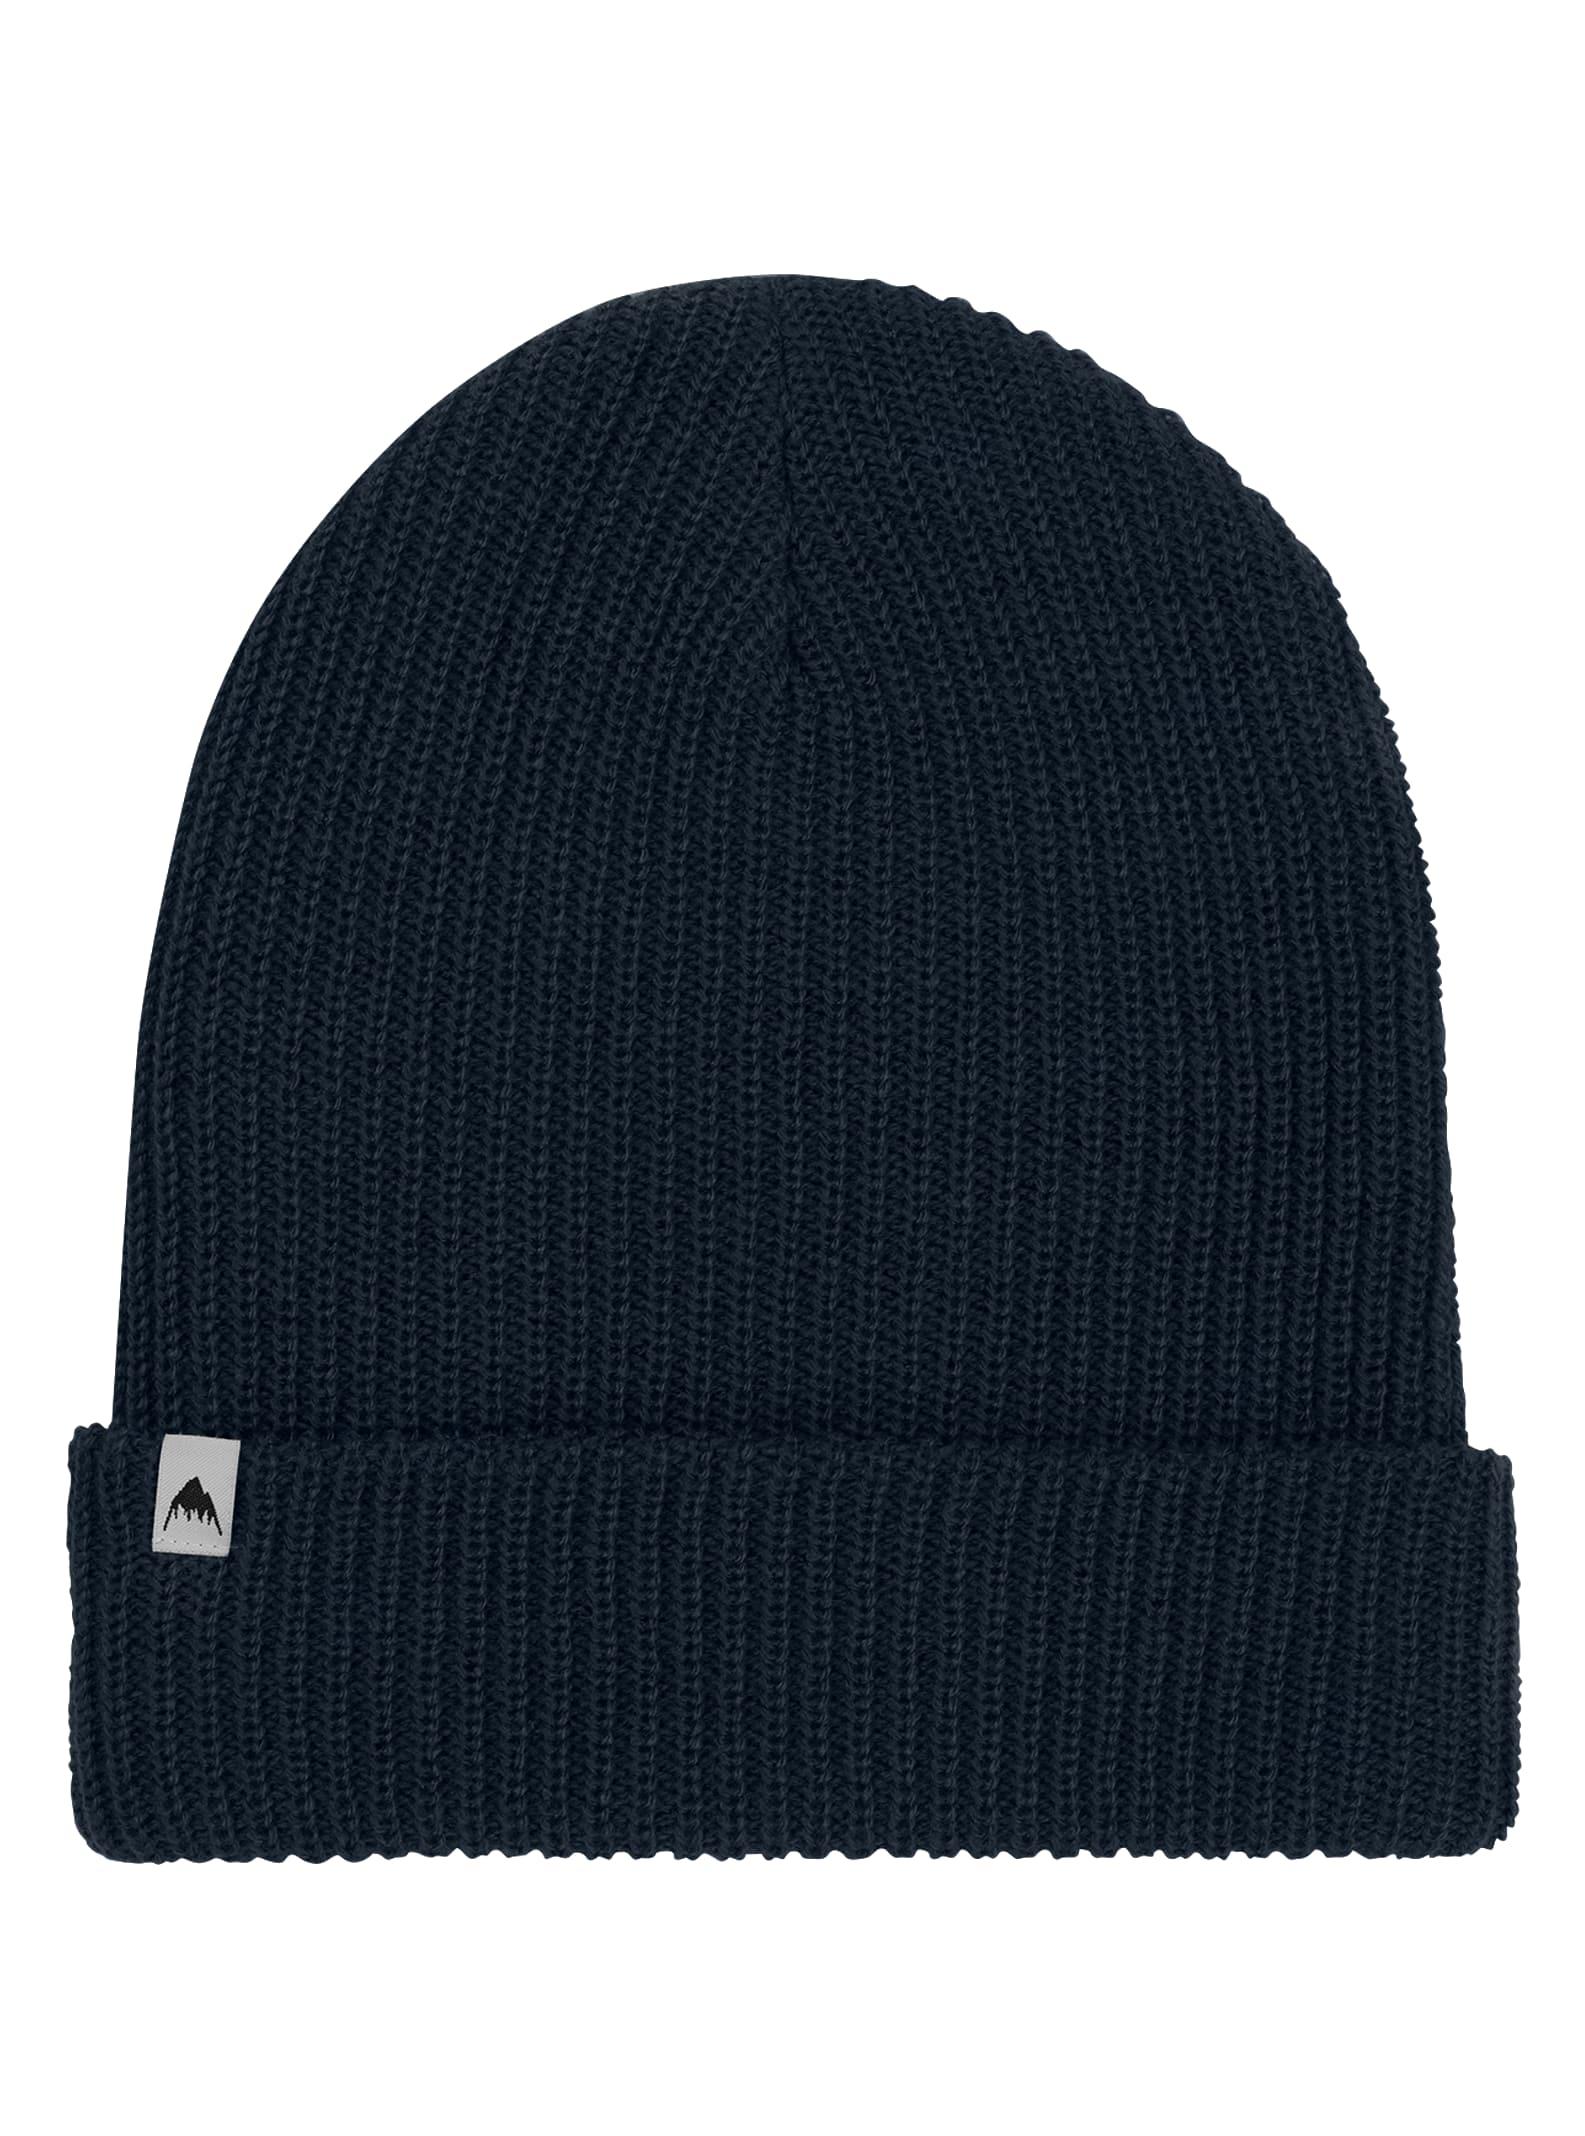 65432912 Men's Hats & Beanies   Burton Snowboards